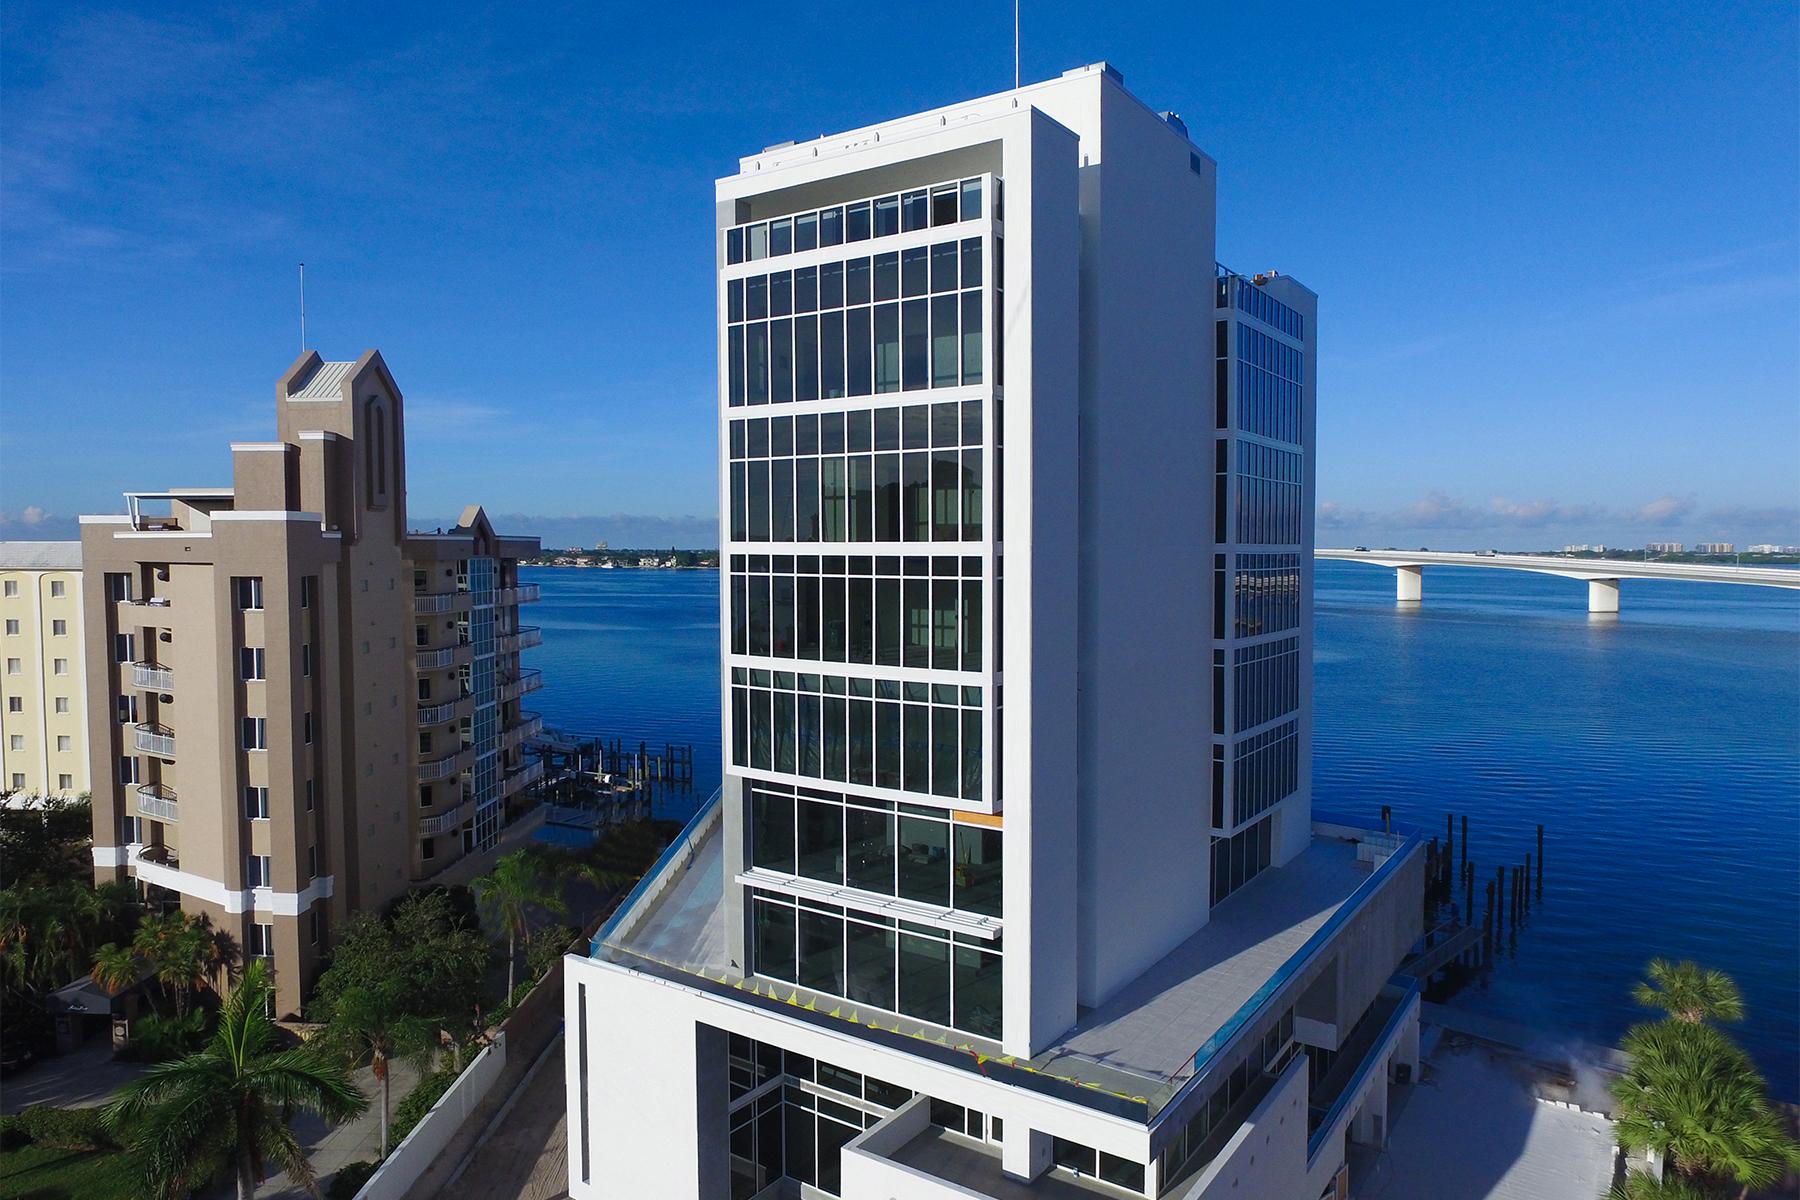 Condominio per Vendita alle ore AQUA 280 Golden Gate Pt Grand Resid Sarasota, Florida, 34236 Stati Uniti